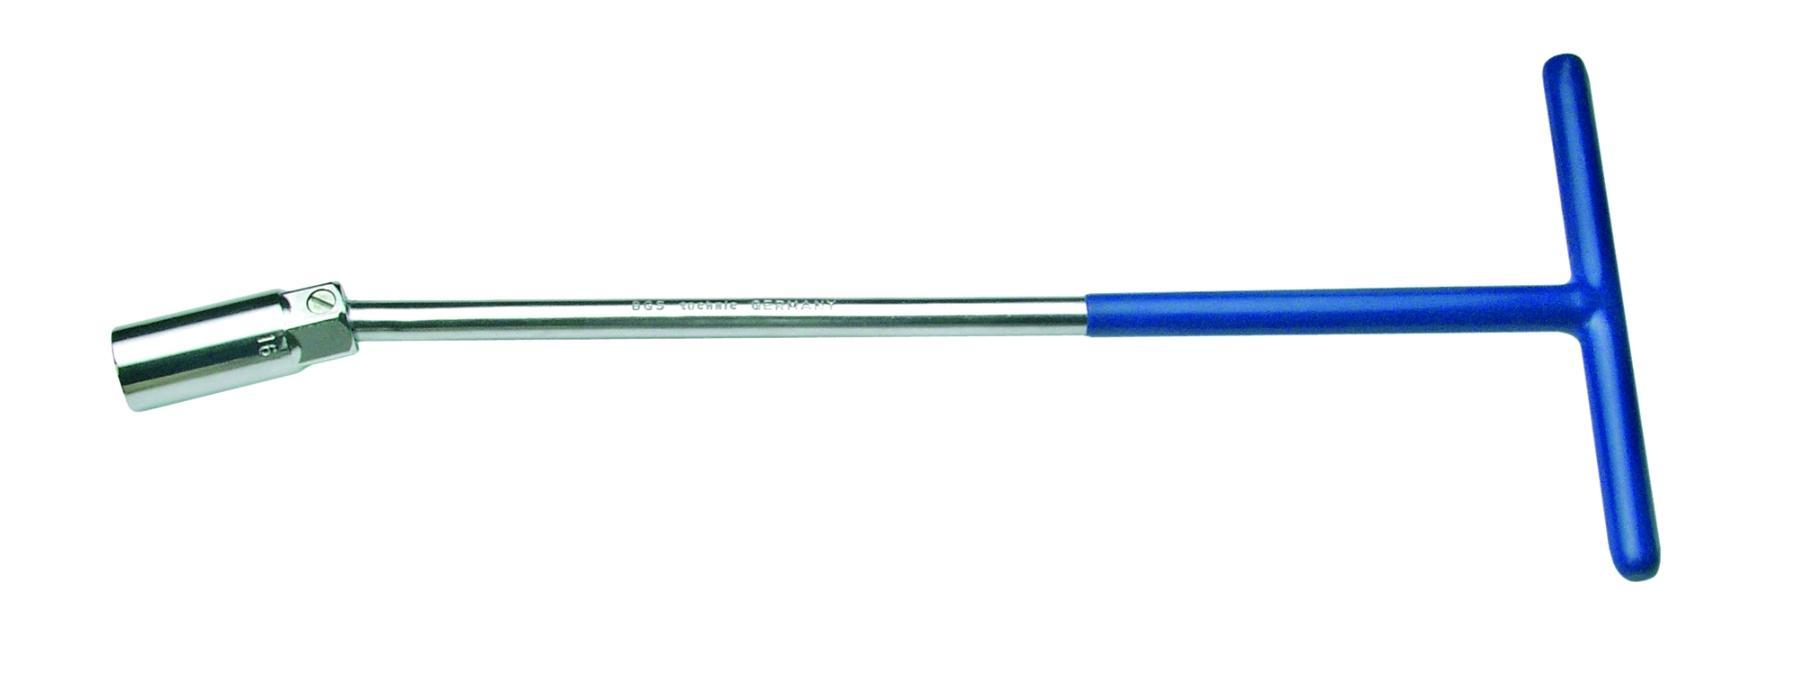 SW-Stahl  03620L Zündkerzenschlüssel